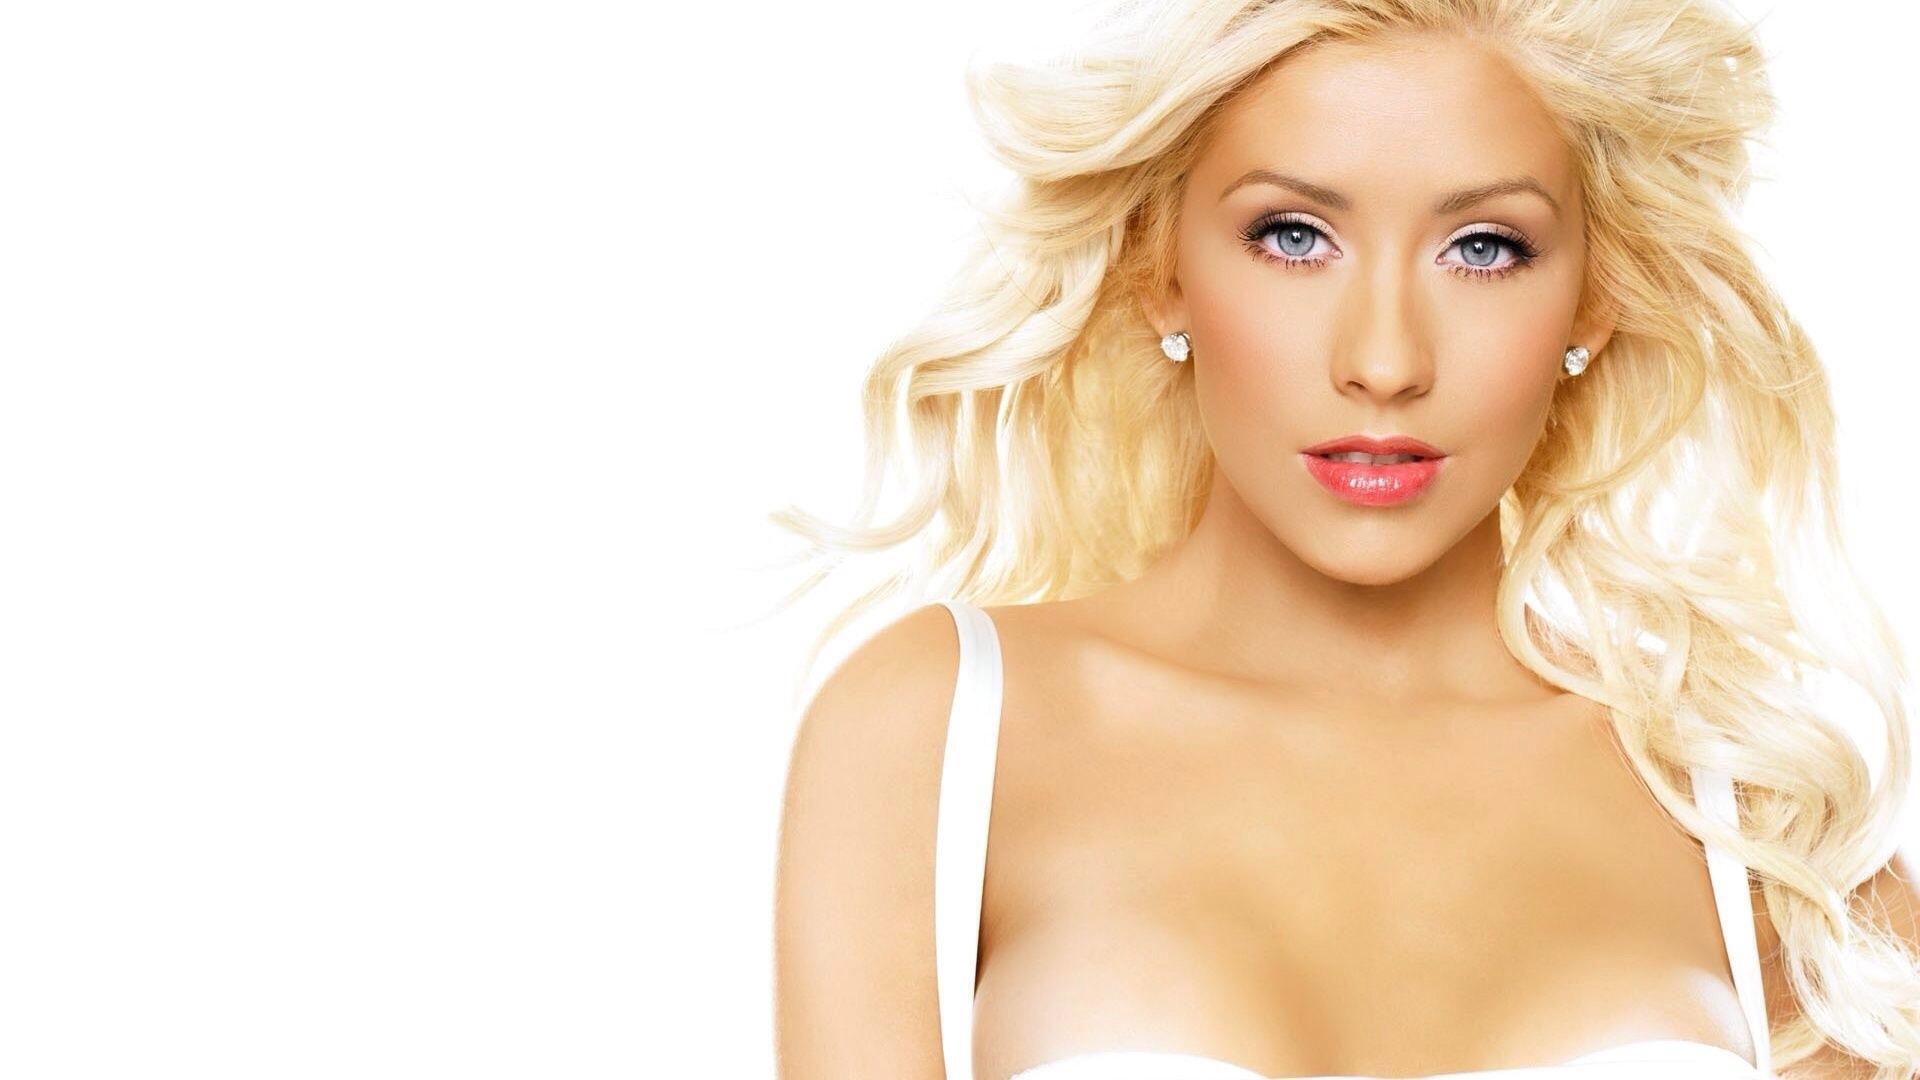 Christina Aguilera For Desktop